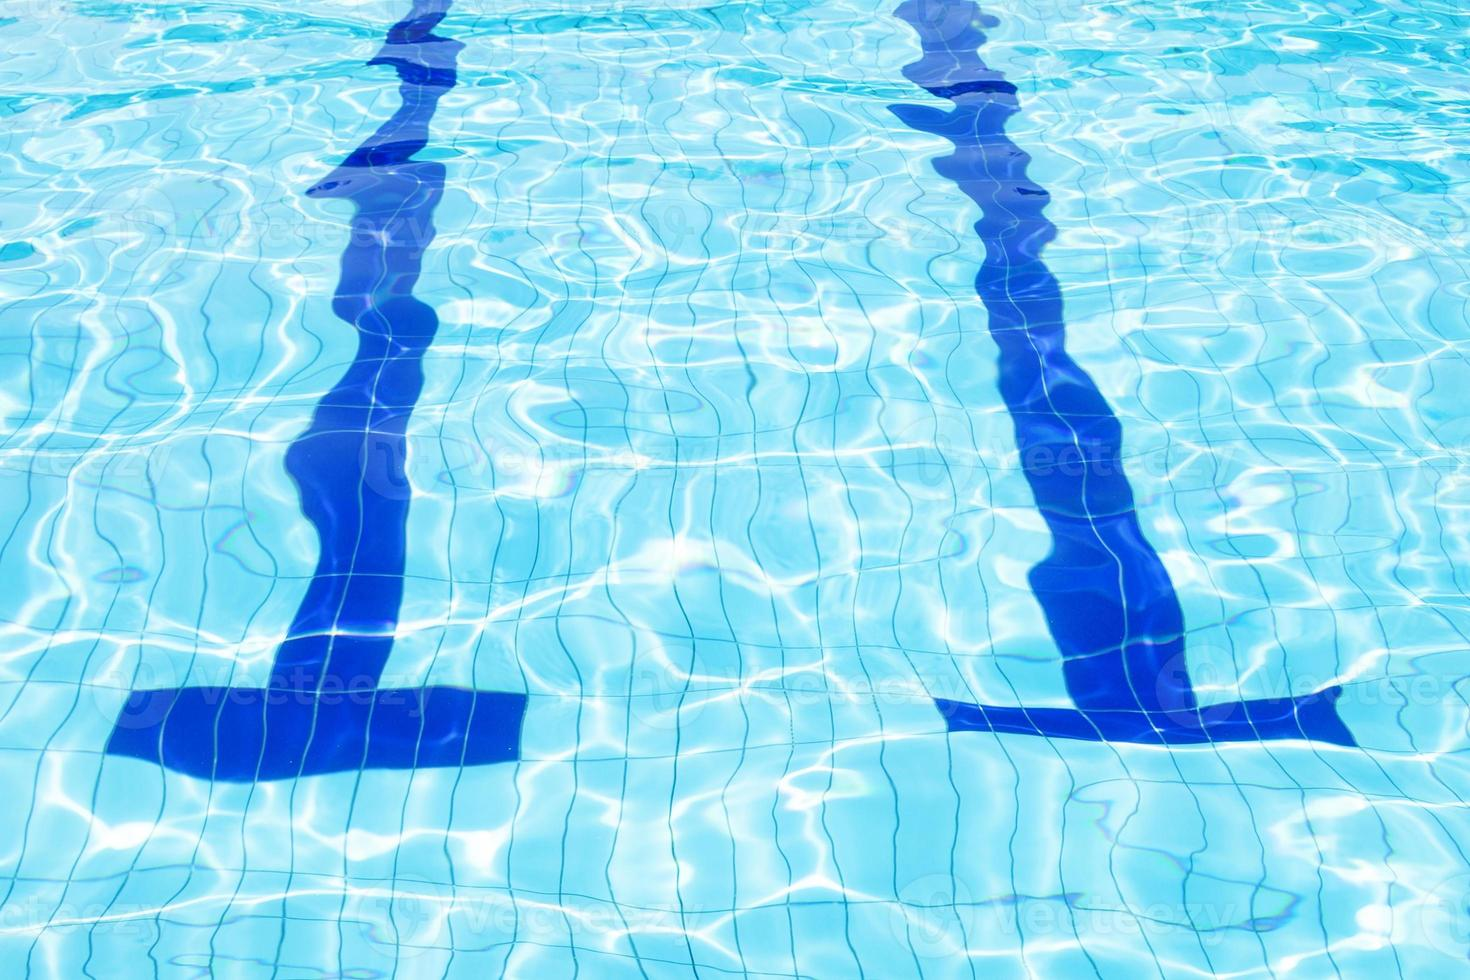 fondo de la piscina foto